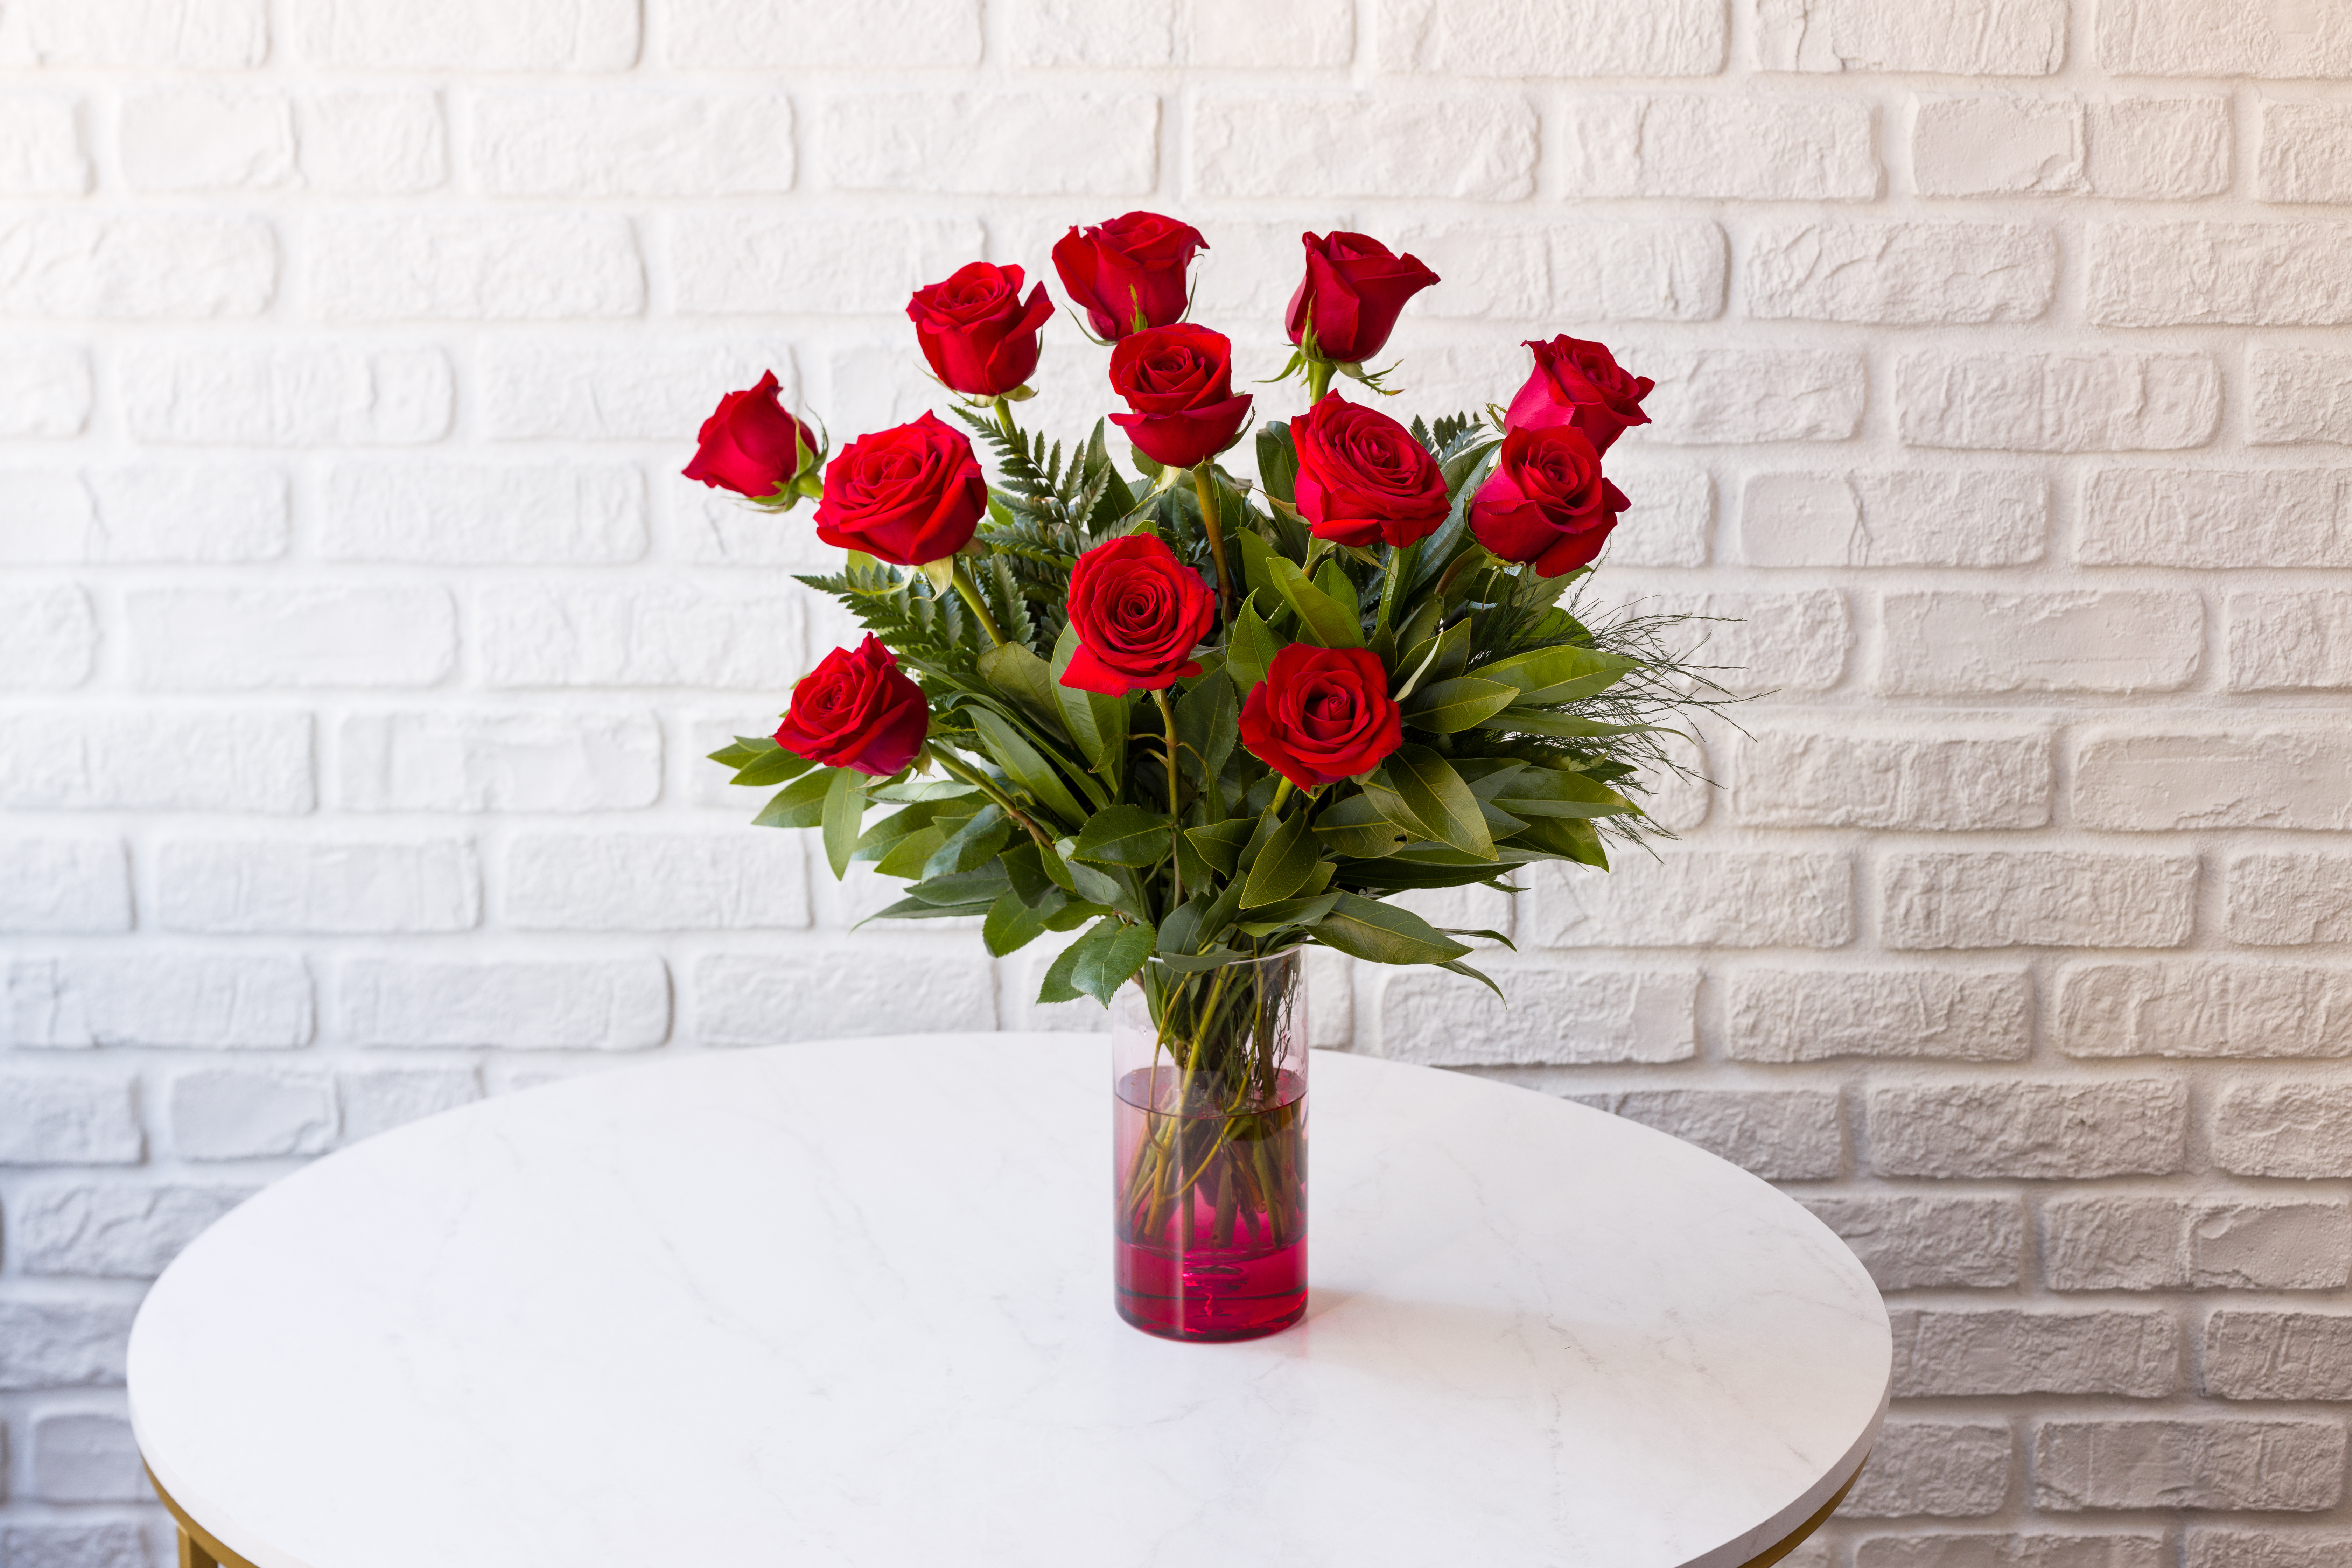 Roses-debbilily